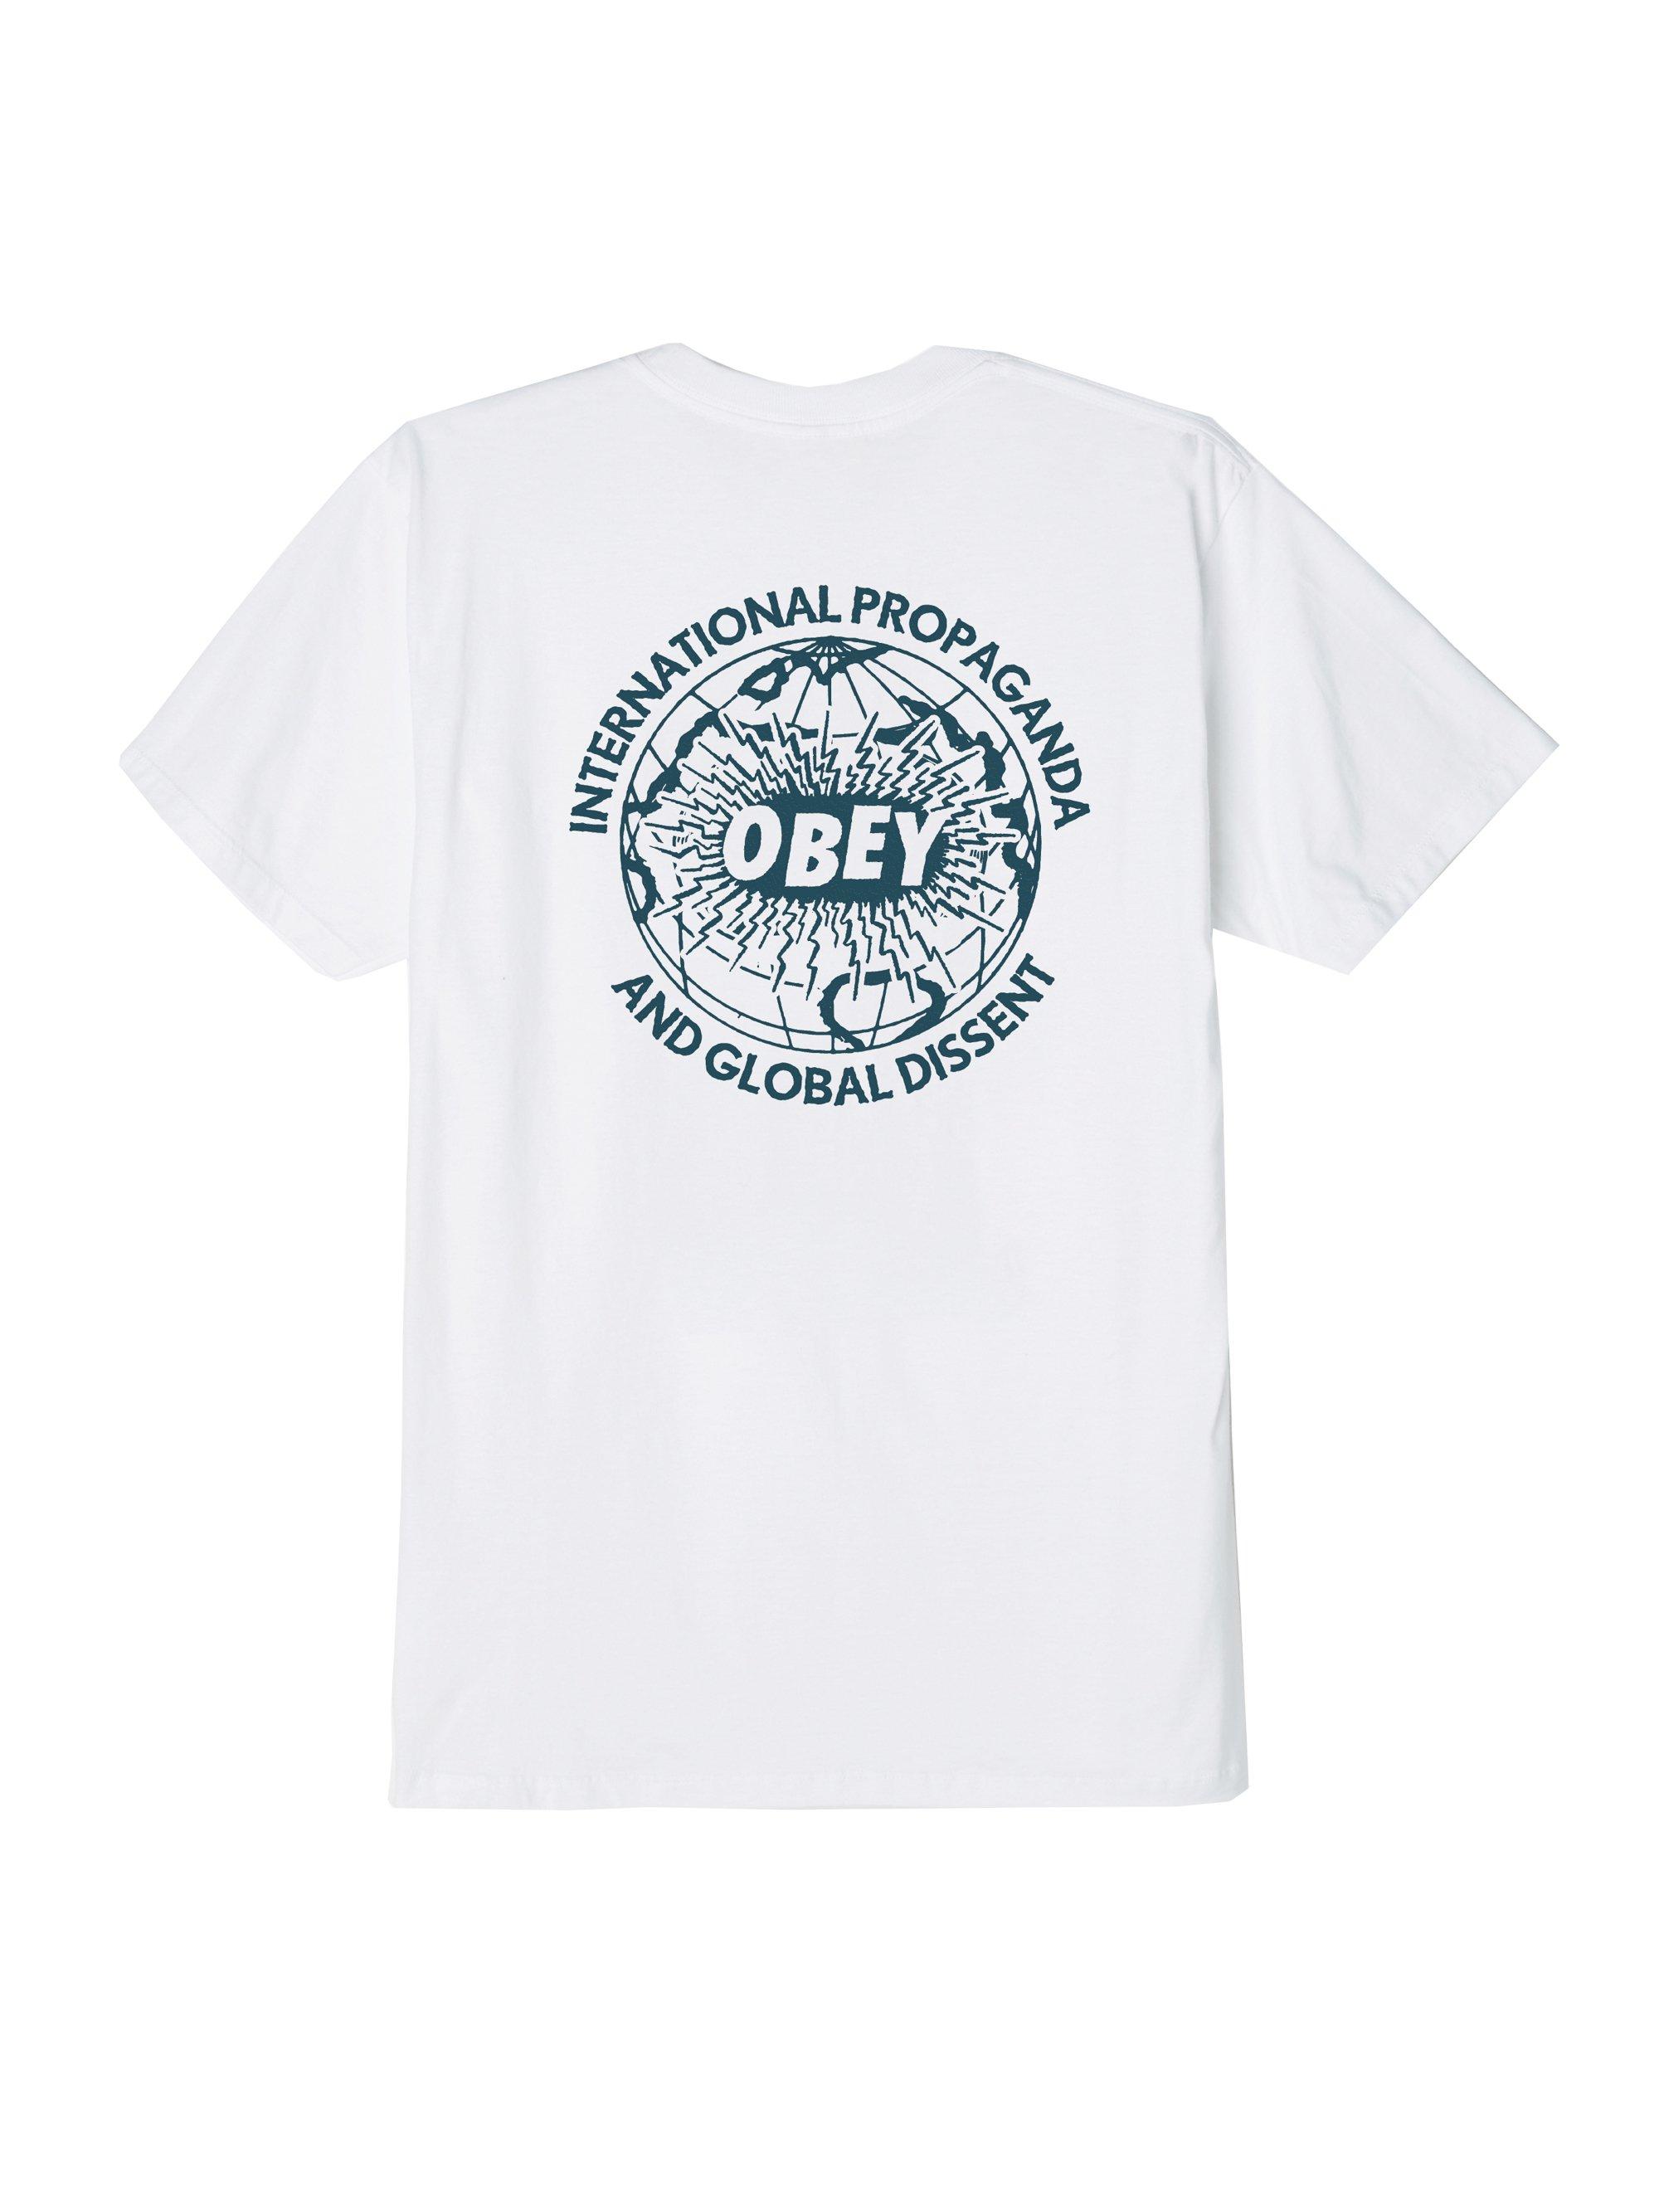 OBEY_Obey_Global_Dissent_Basic_T-Shirt_163081902_WHT_1_2000x.jpg